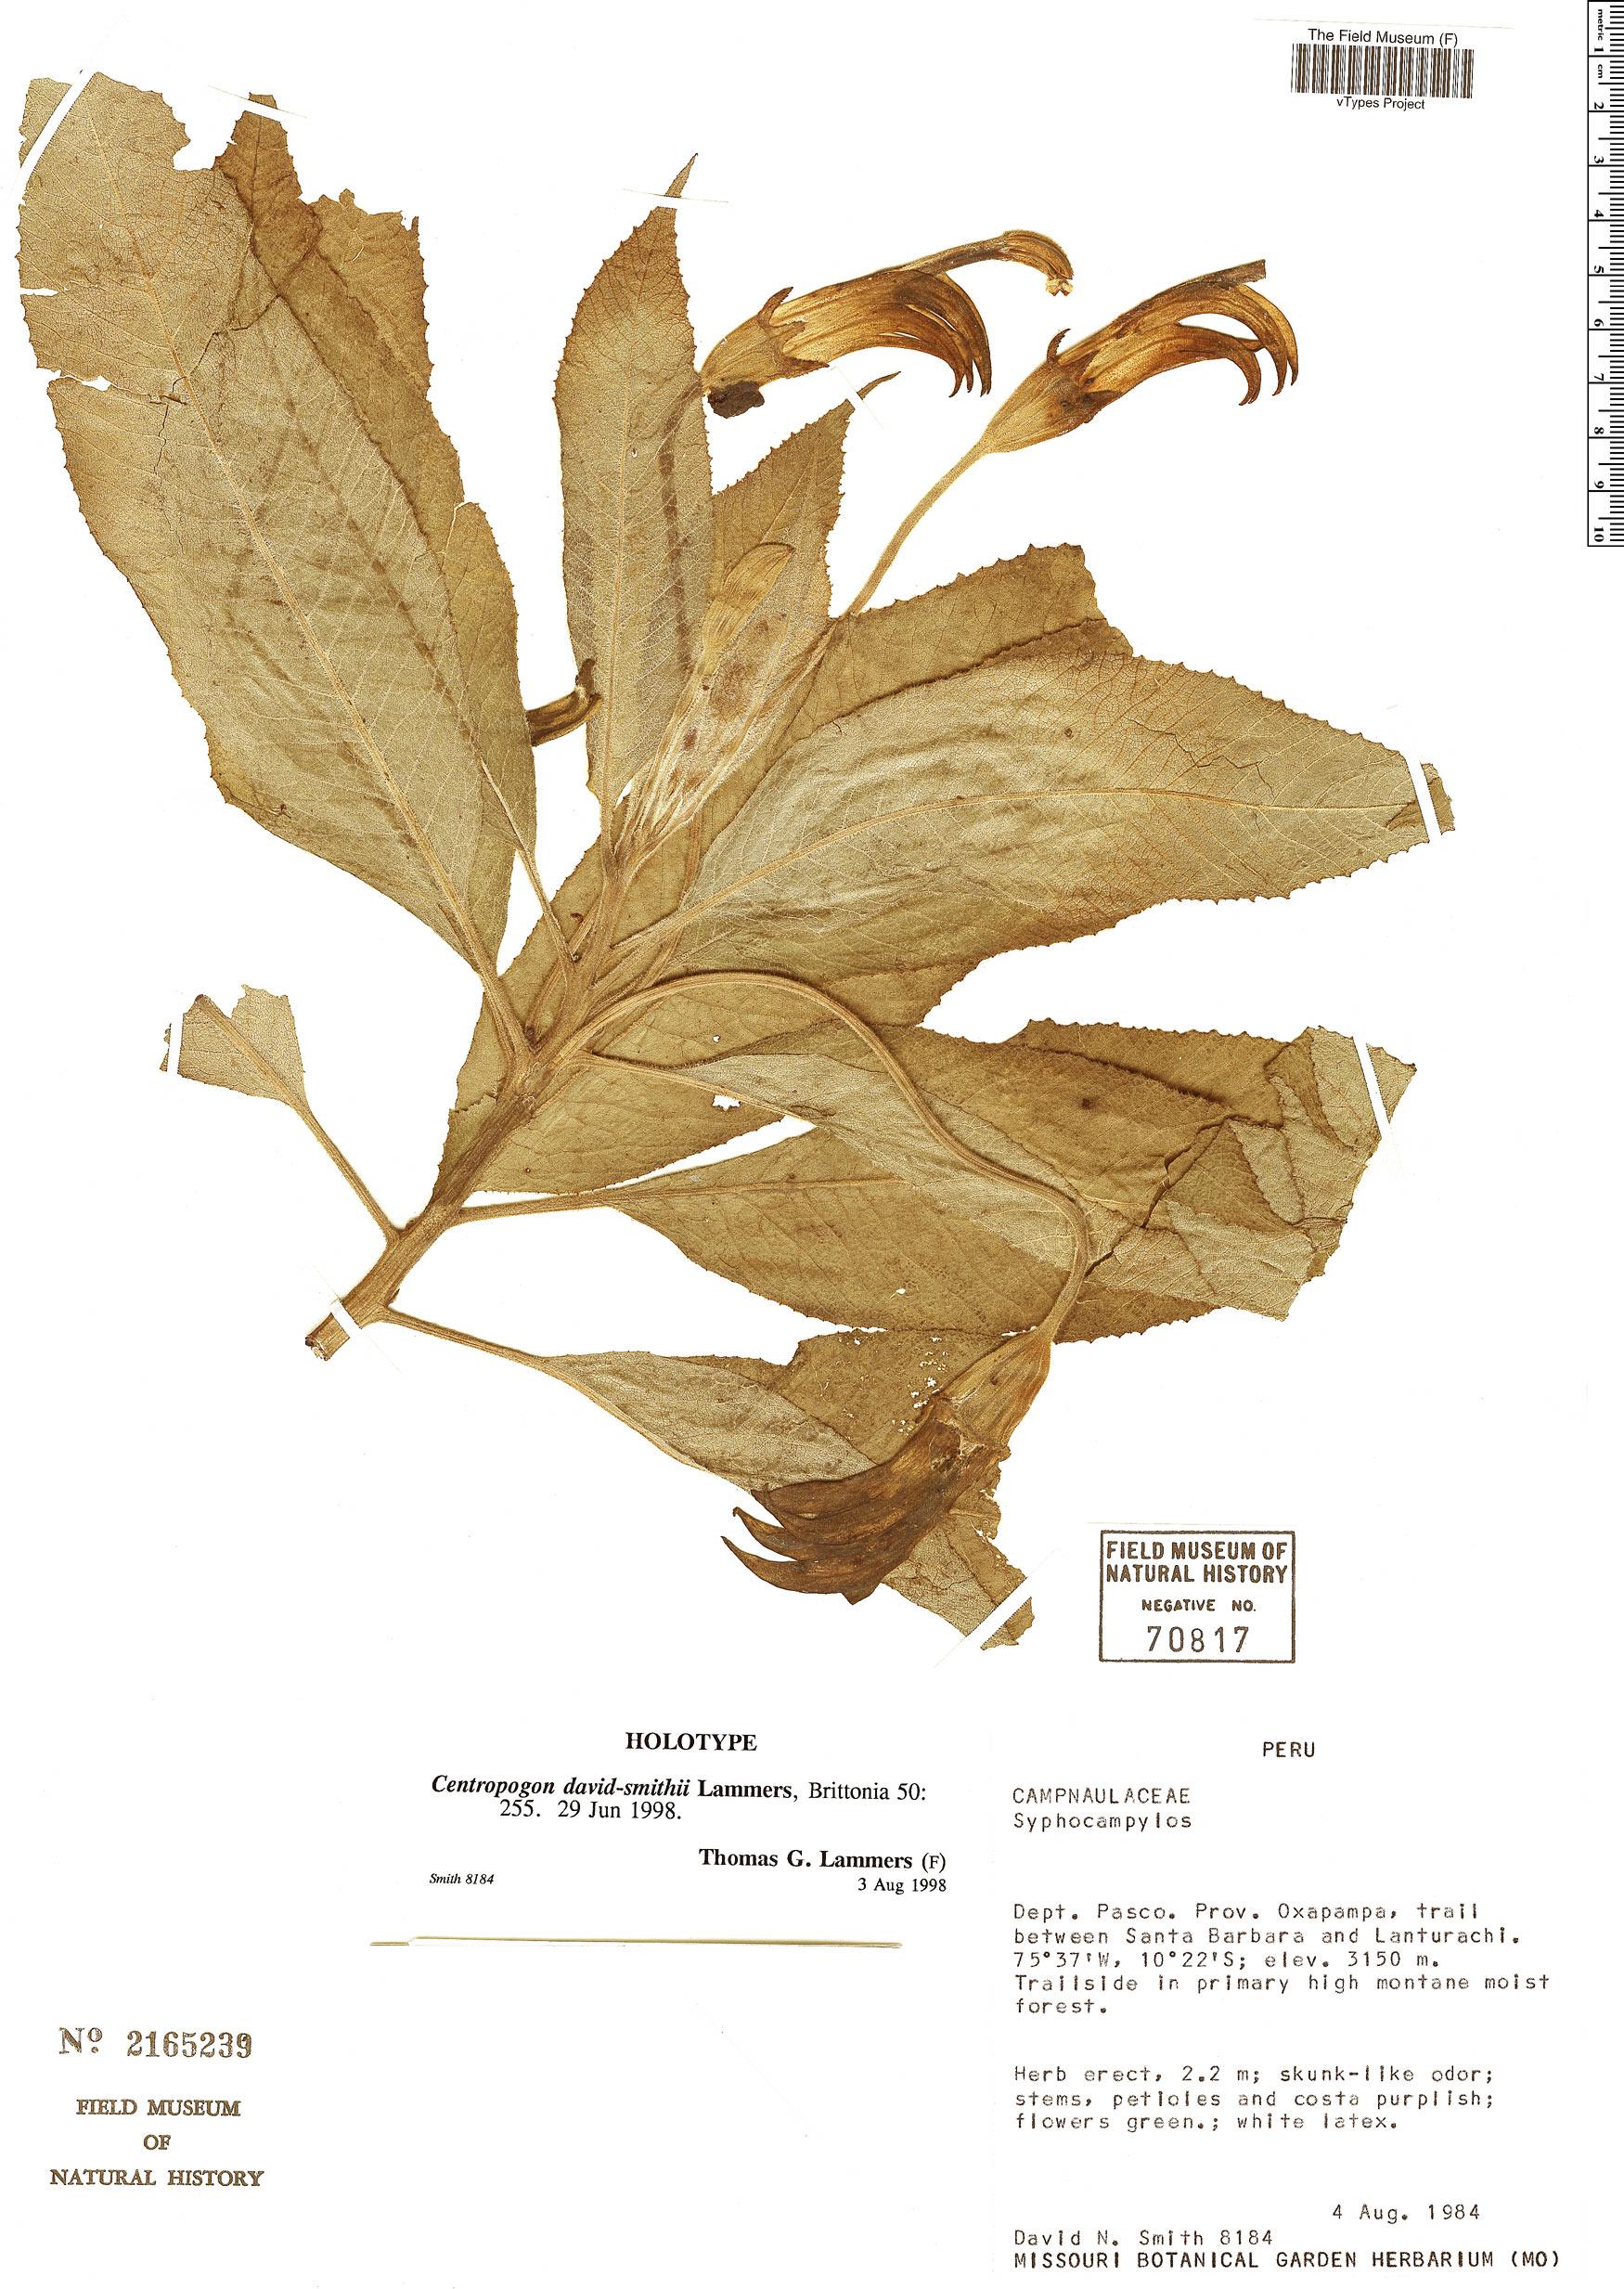 Specimen: Centropogon david-smithii